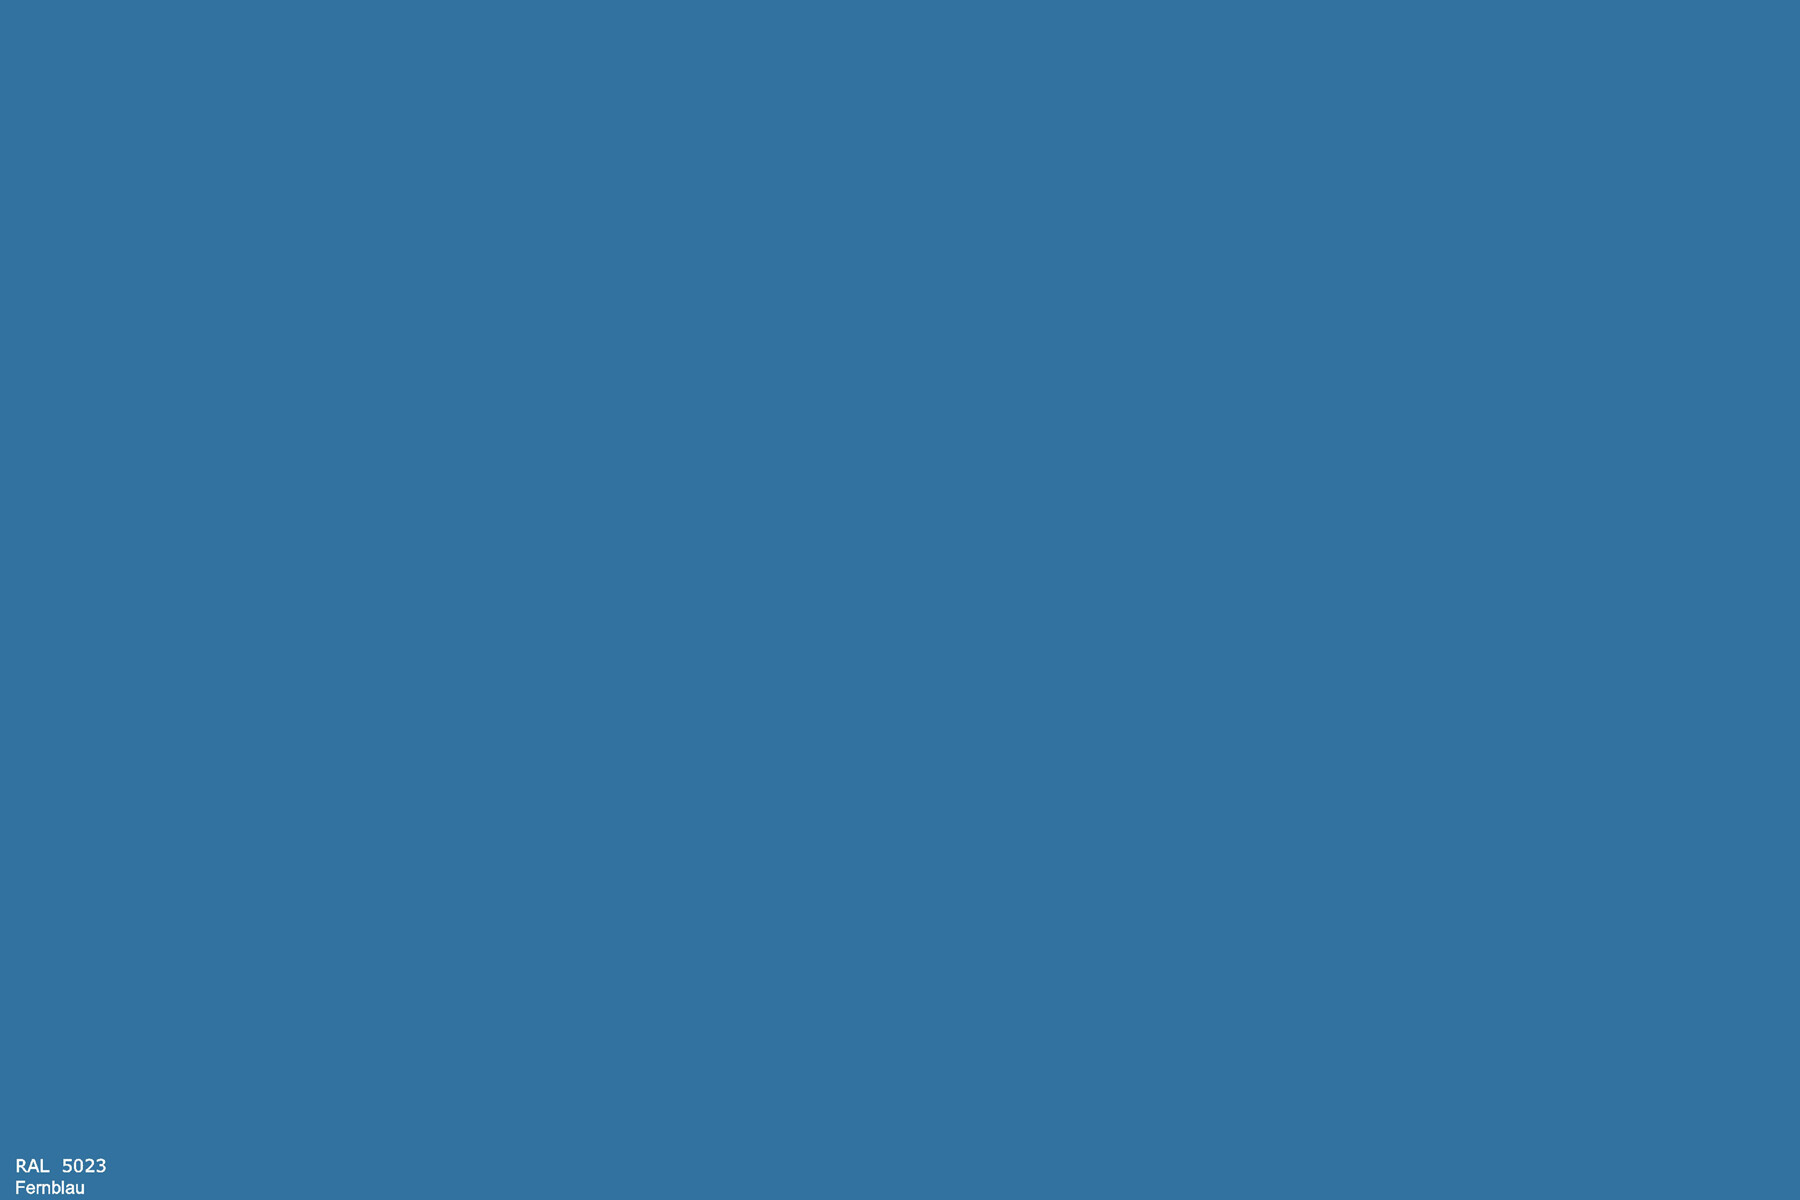 PlateART Duschrückwand mit Motiv RAL 5023 Fernblau